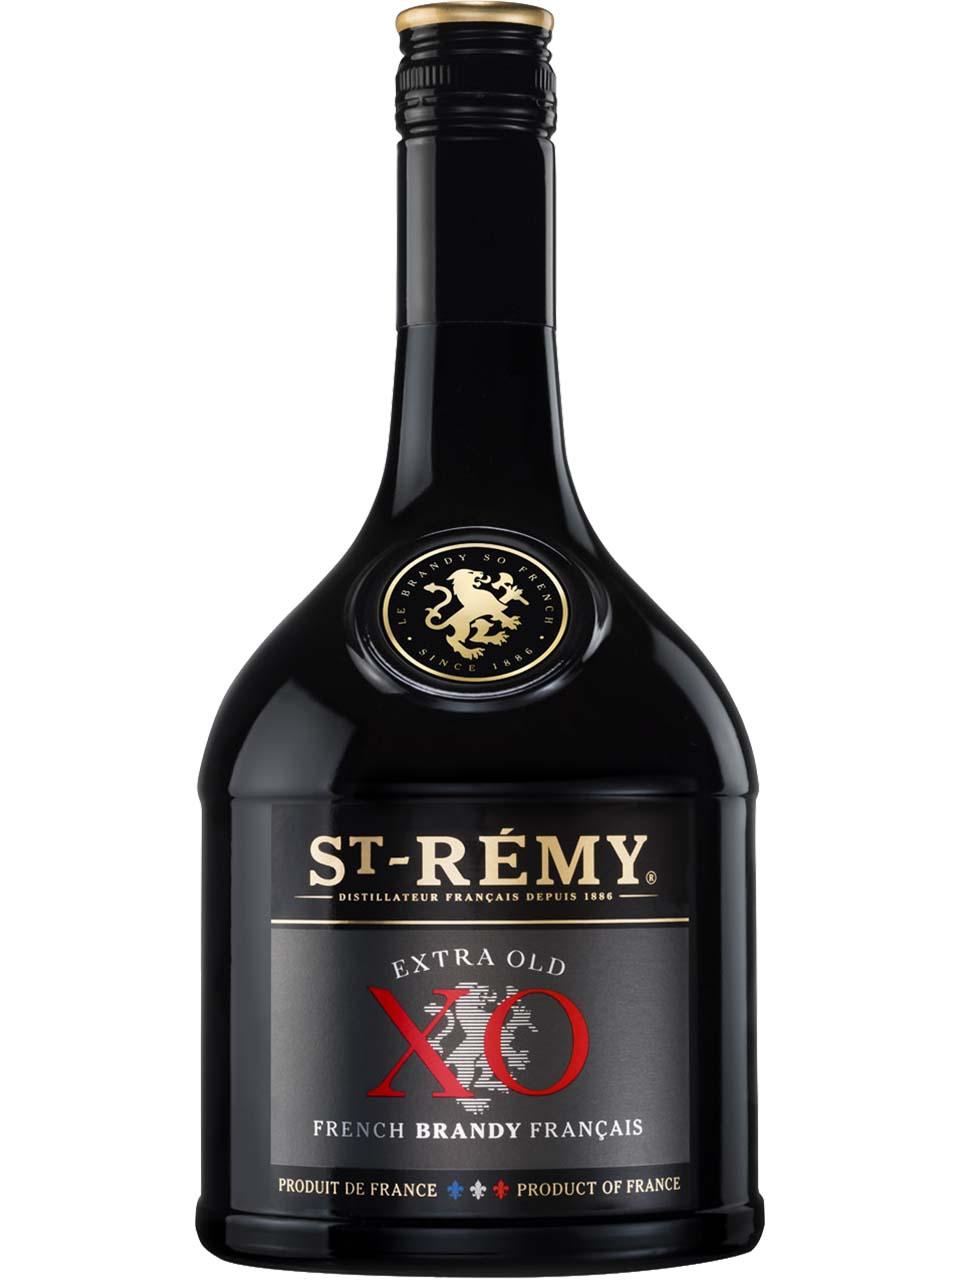 St. Remy XO Brandy